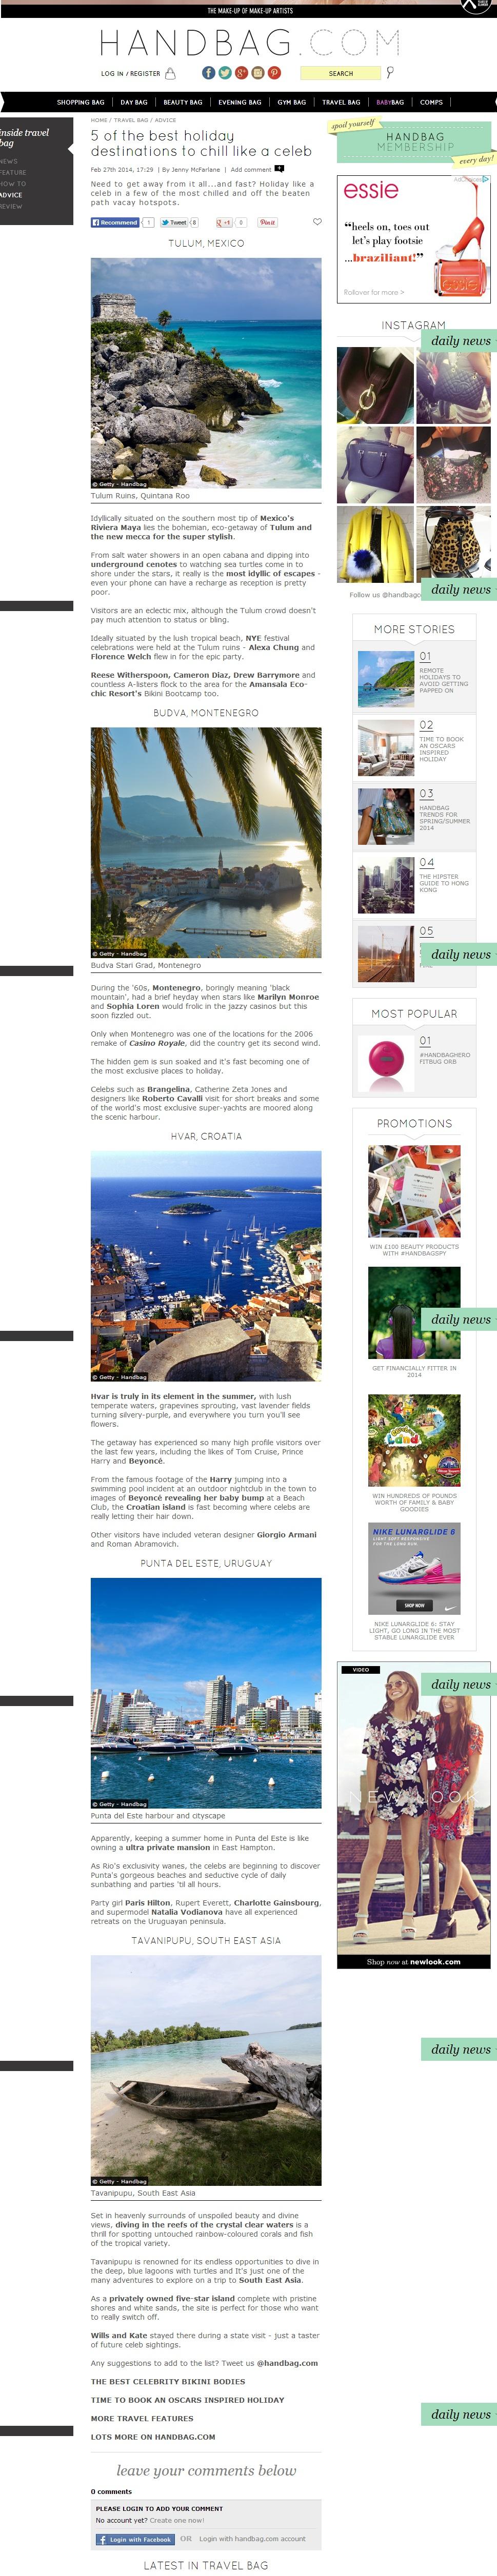 screencapture-www-handbag-com-travel-bag-advice-a554022-5-of-the-best-holiday-destinations-to-chill-like-a-celeb-html